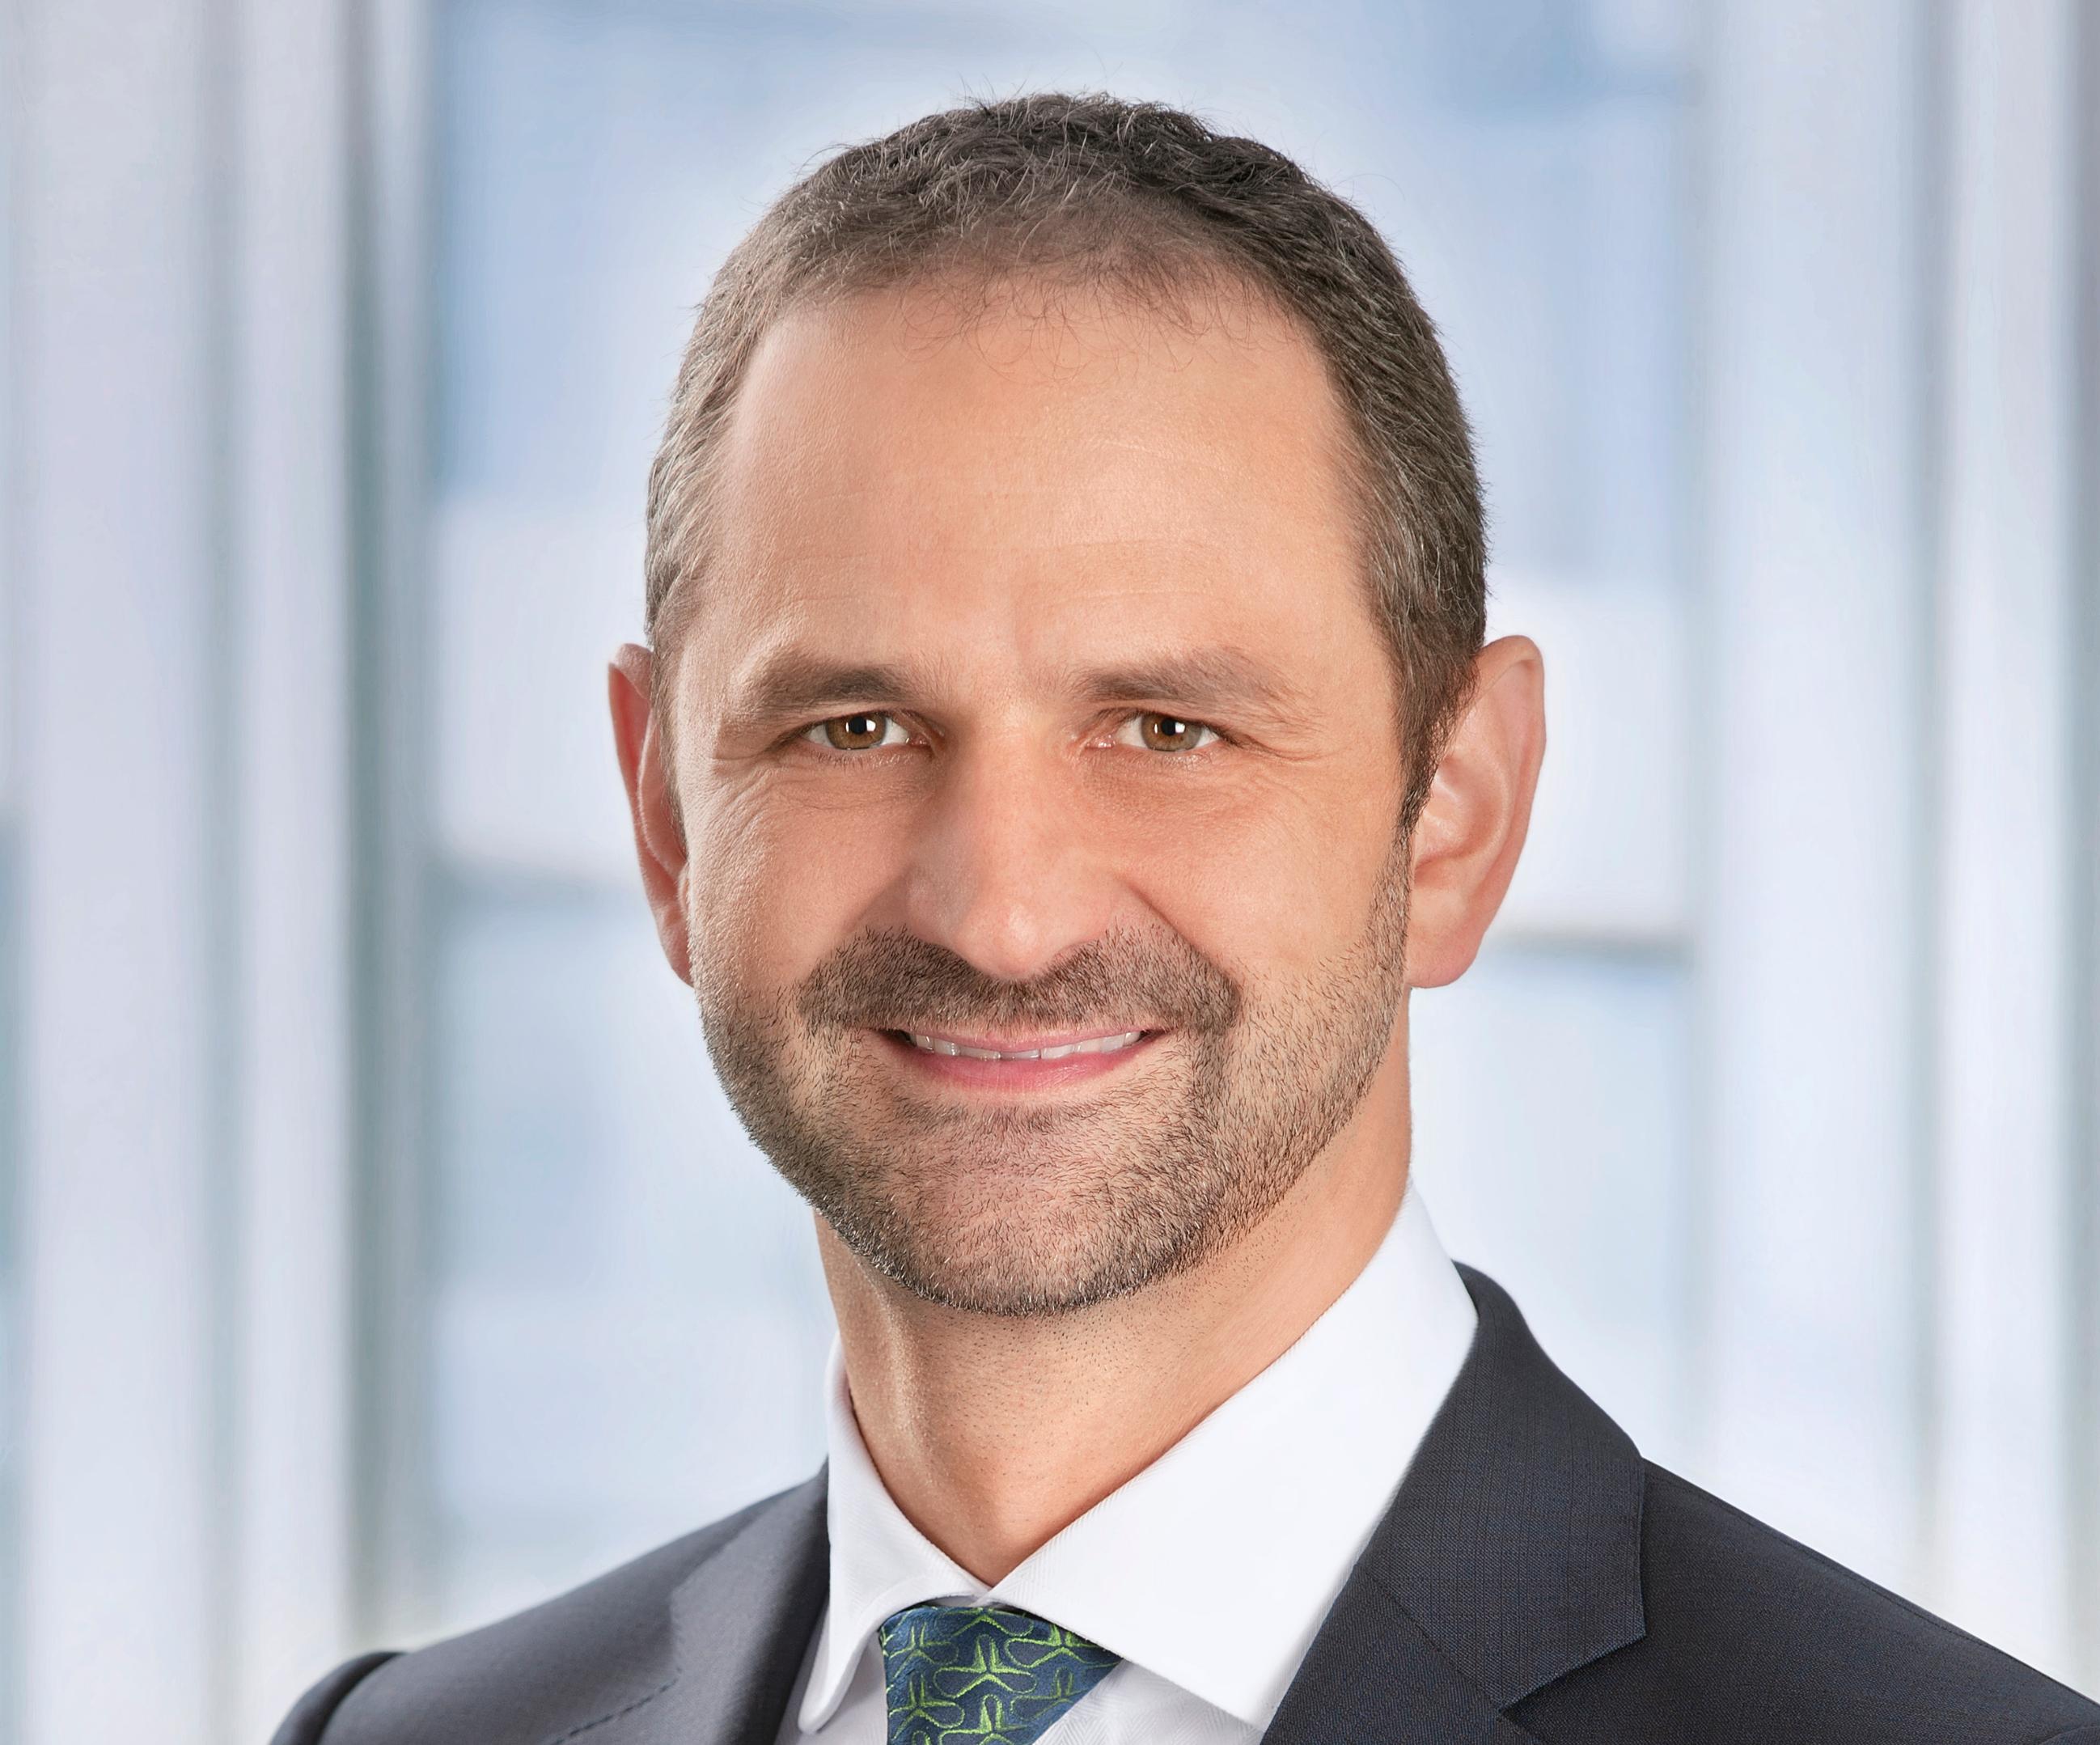 Dr. Christoph Steger, Engel Austria.